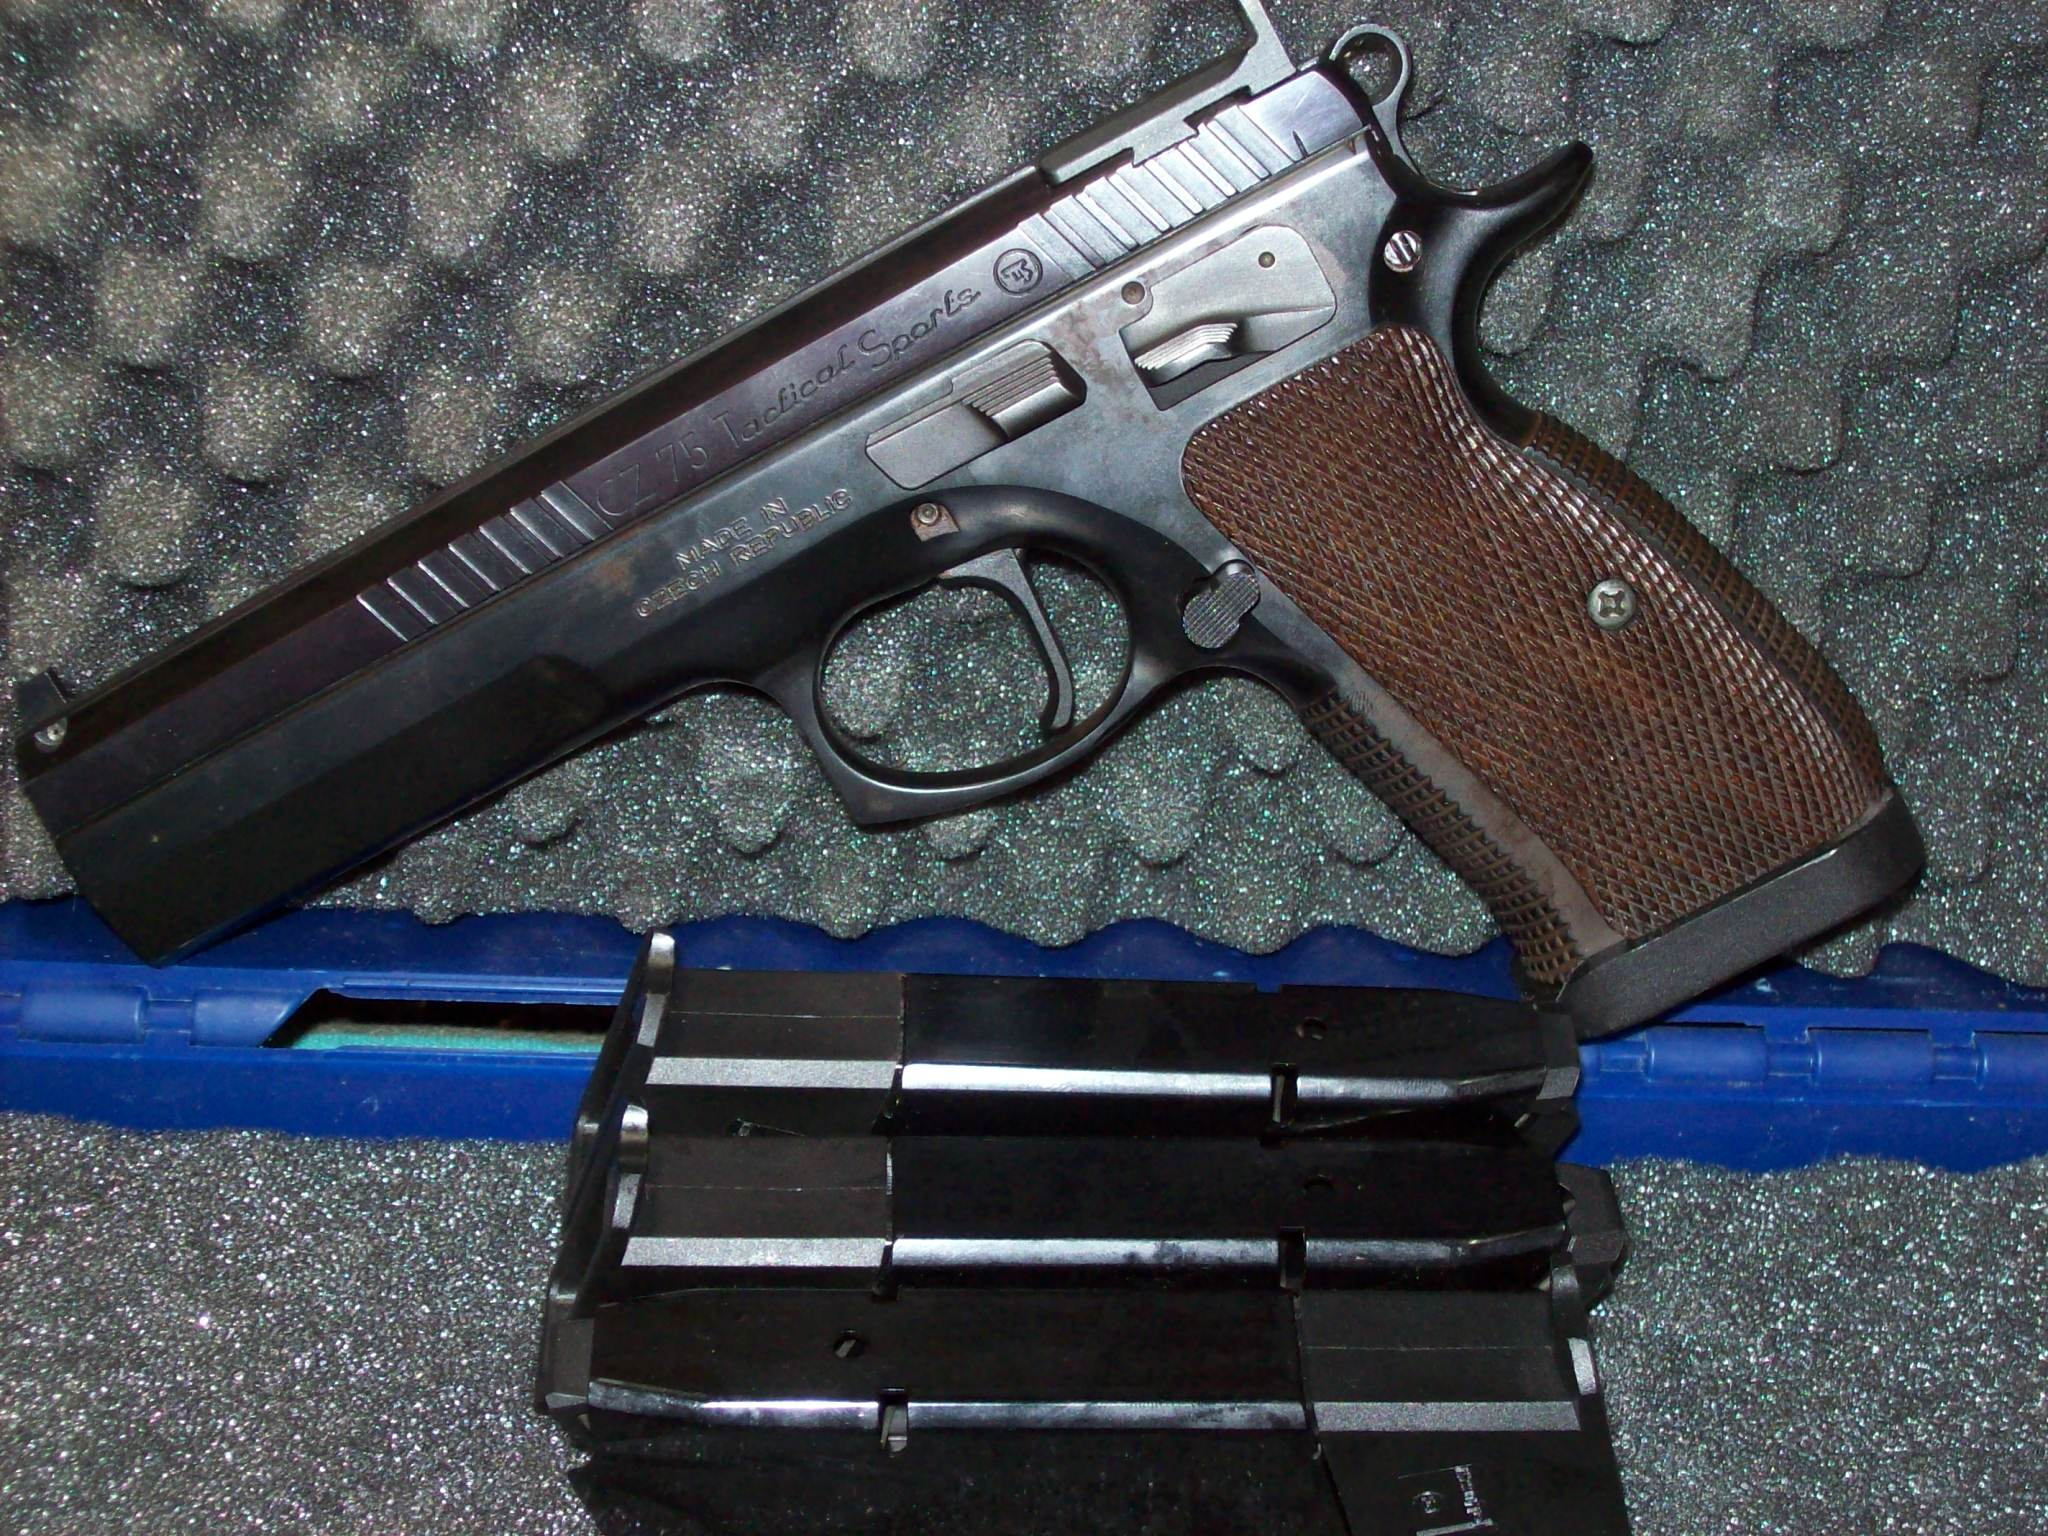 Handguns : Dark International / RK Custom Guns, Your Norinco